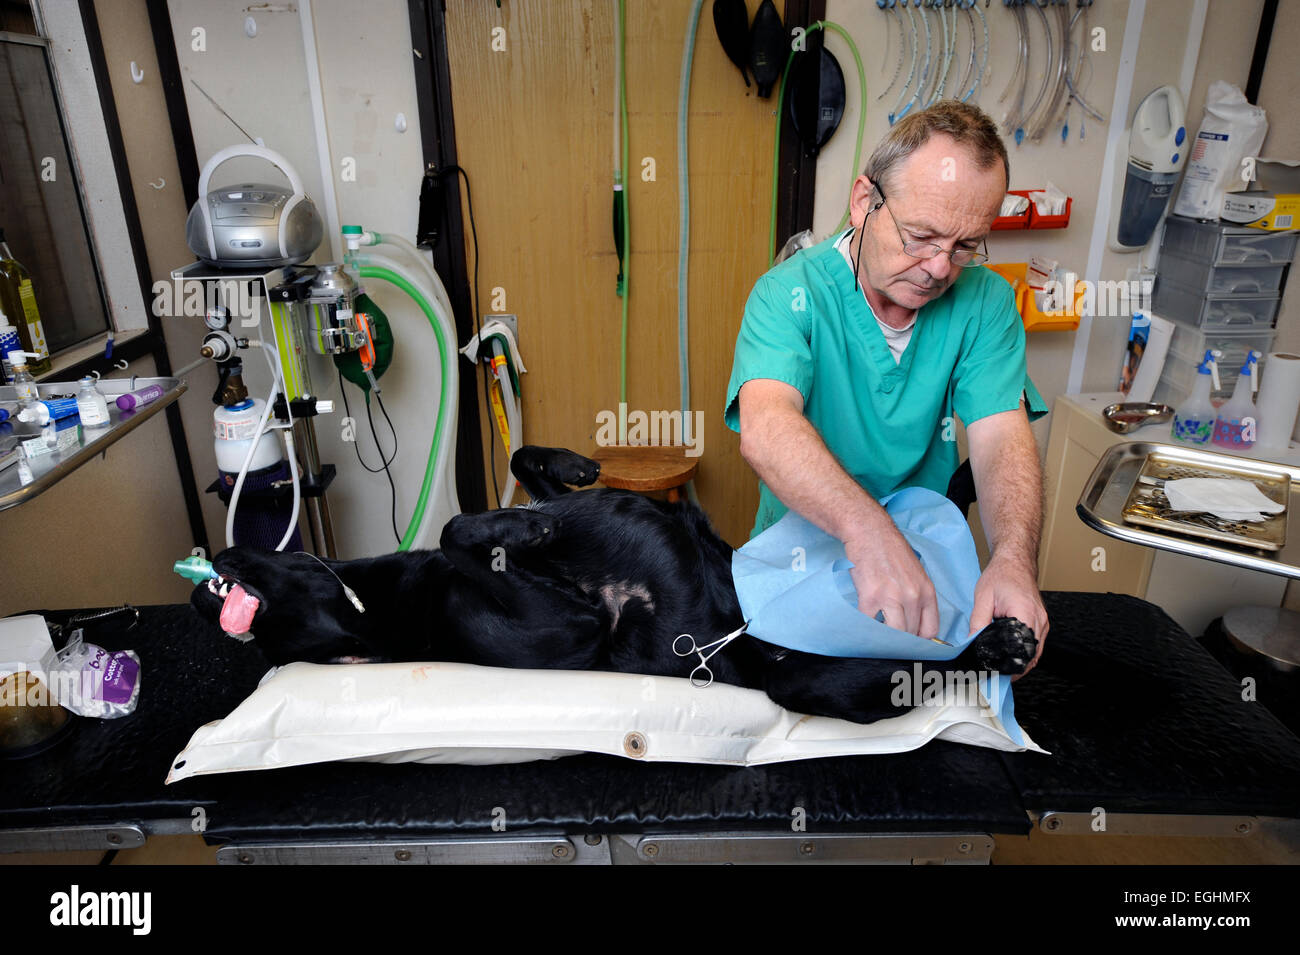 Veterinary Surgeon Krzysztof Trojanowski neuters a dog at the Many Tears Animal Rescue centre near Llanelli, S. - Stock Image